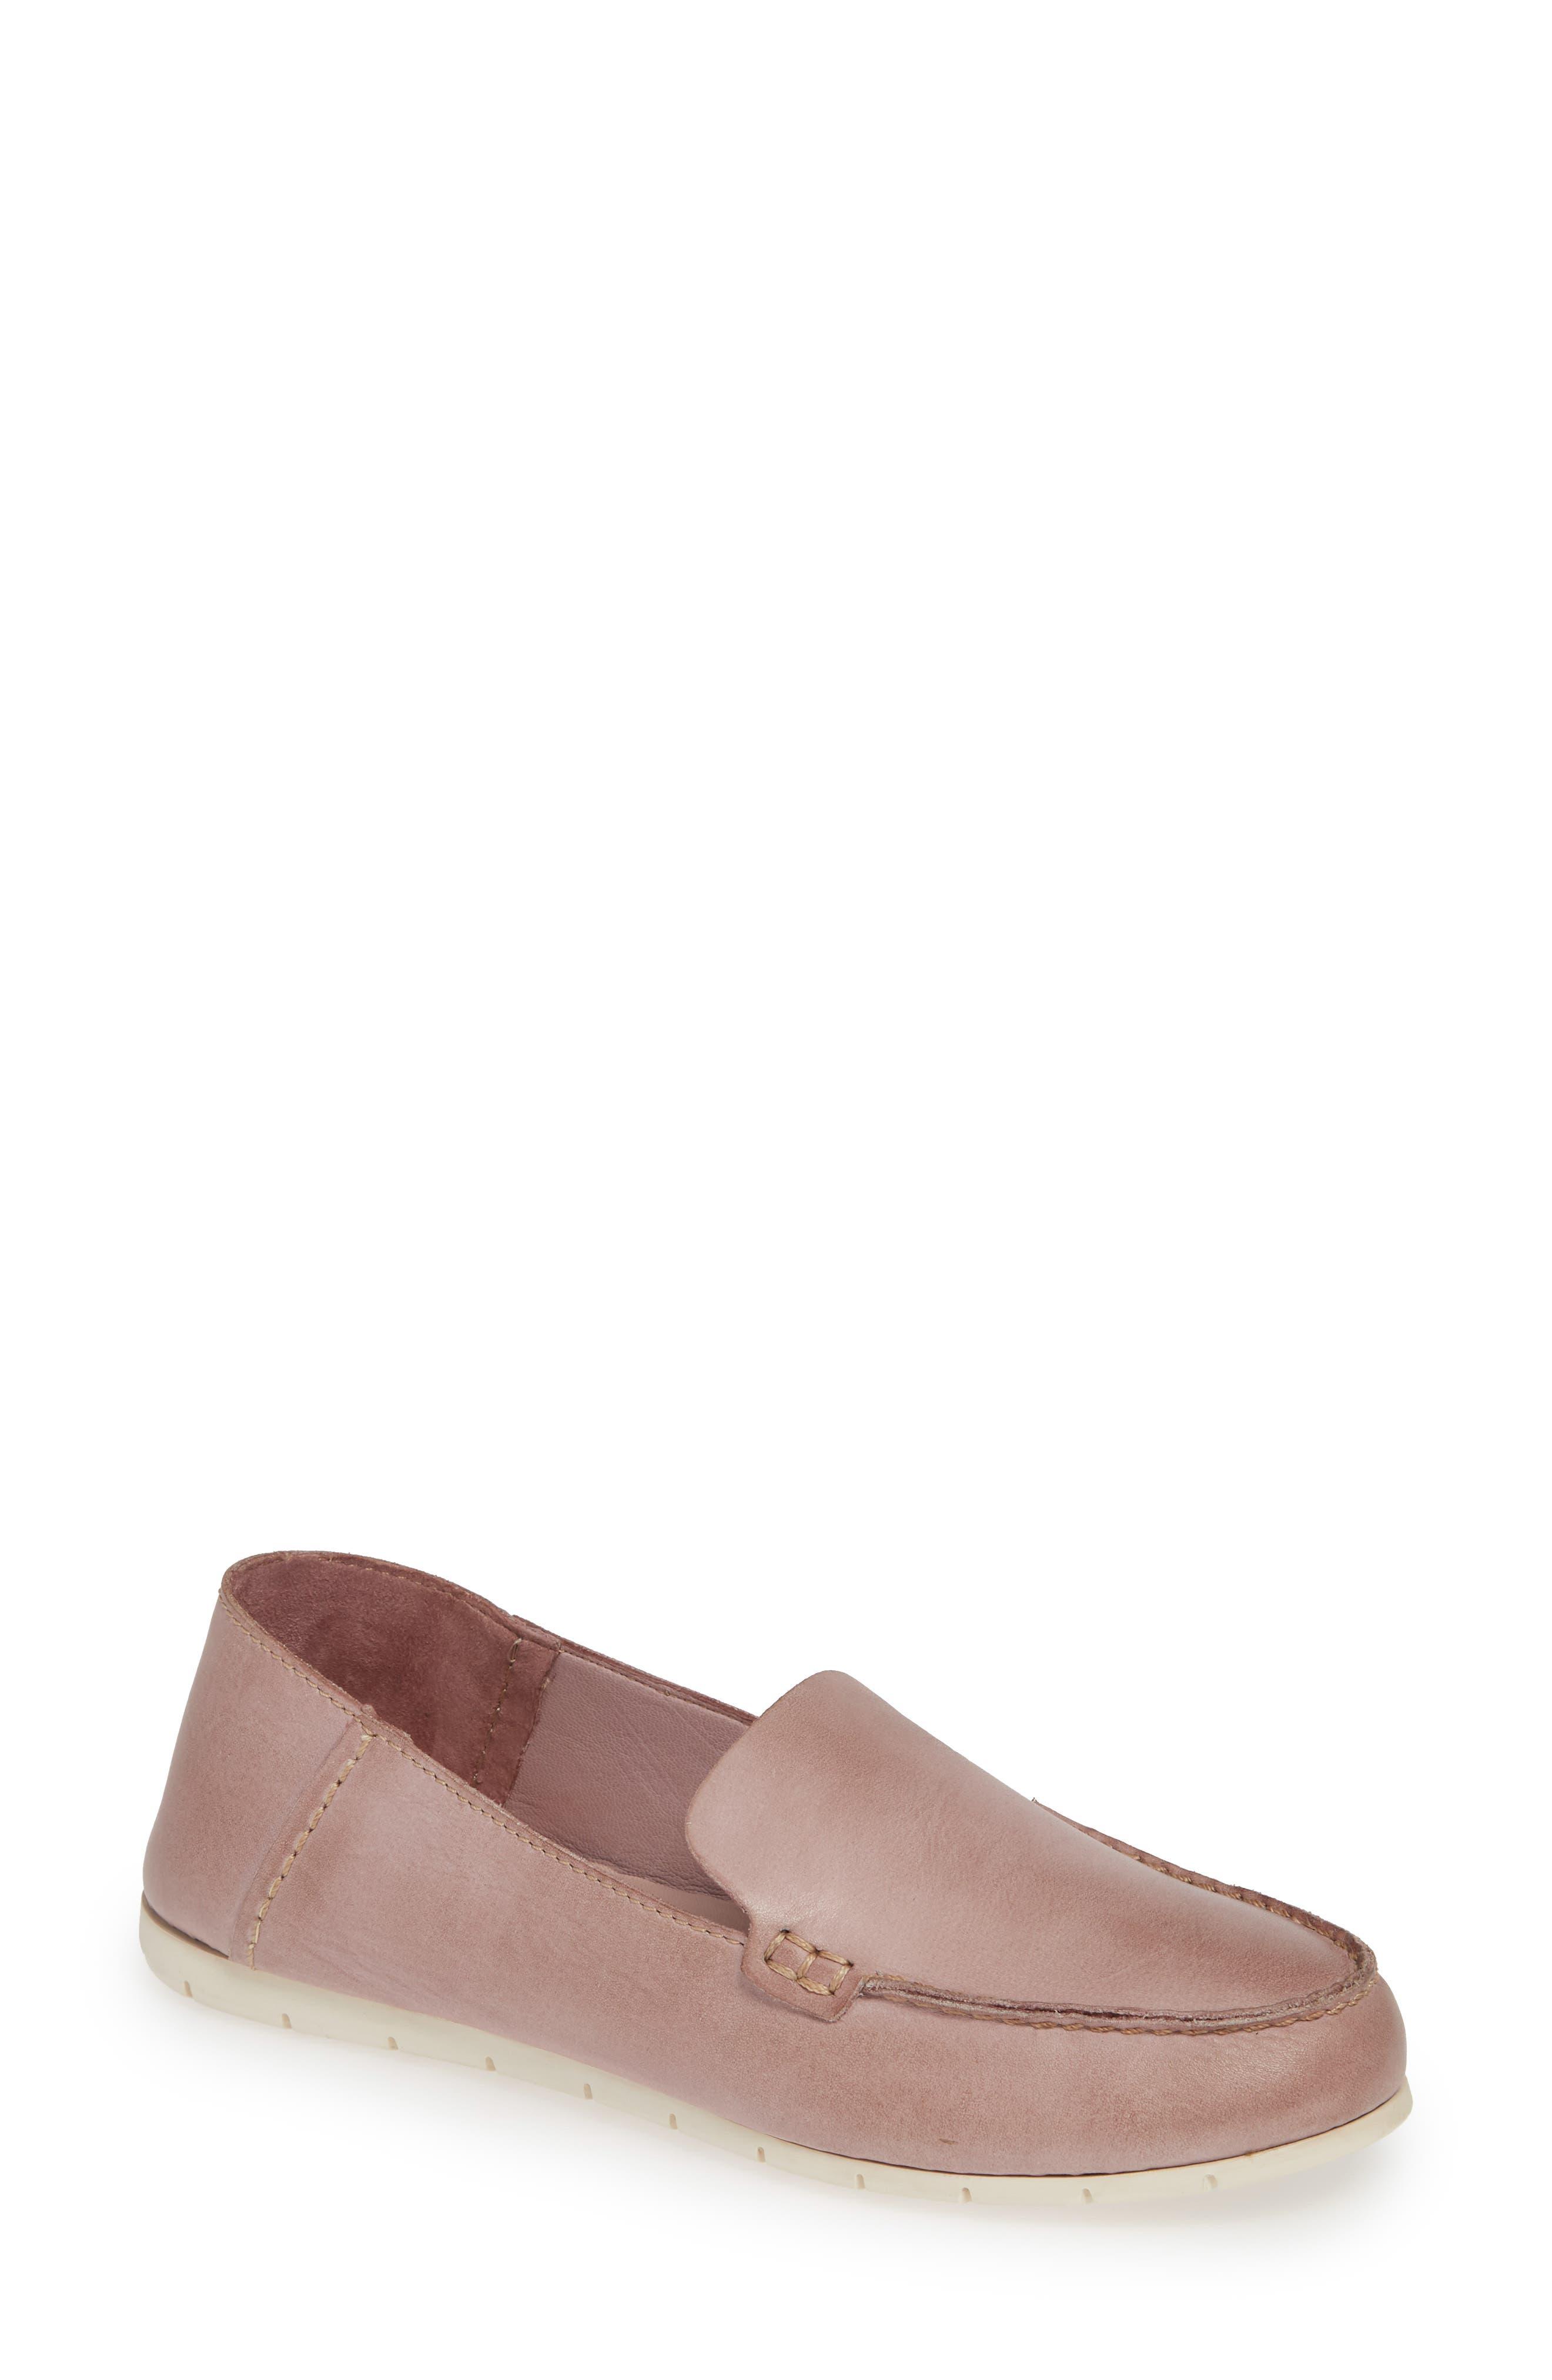 Sedona Venetian Loafer,                         Main,                         color, LILAC